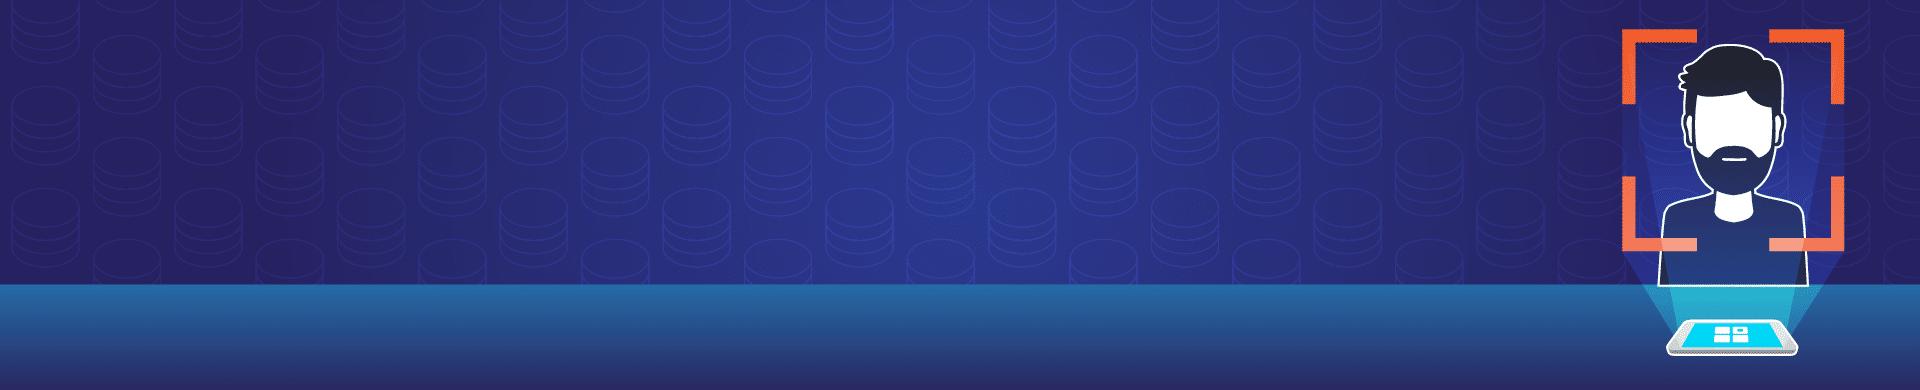 Identify Application Users with DataSunrise